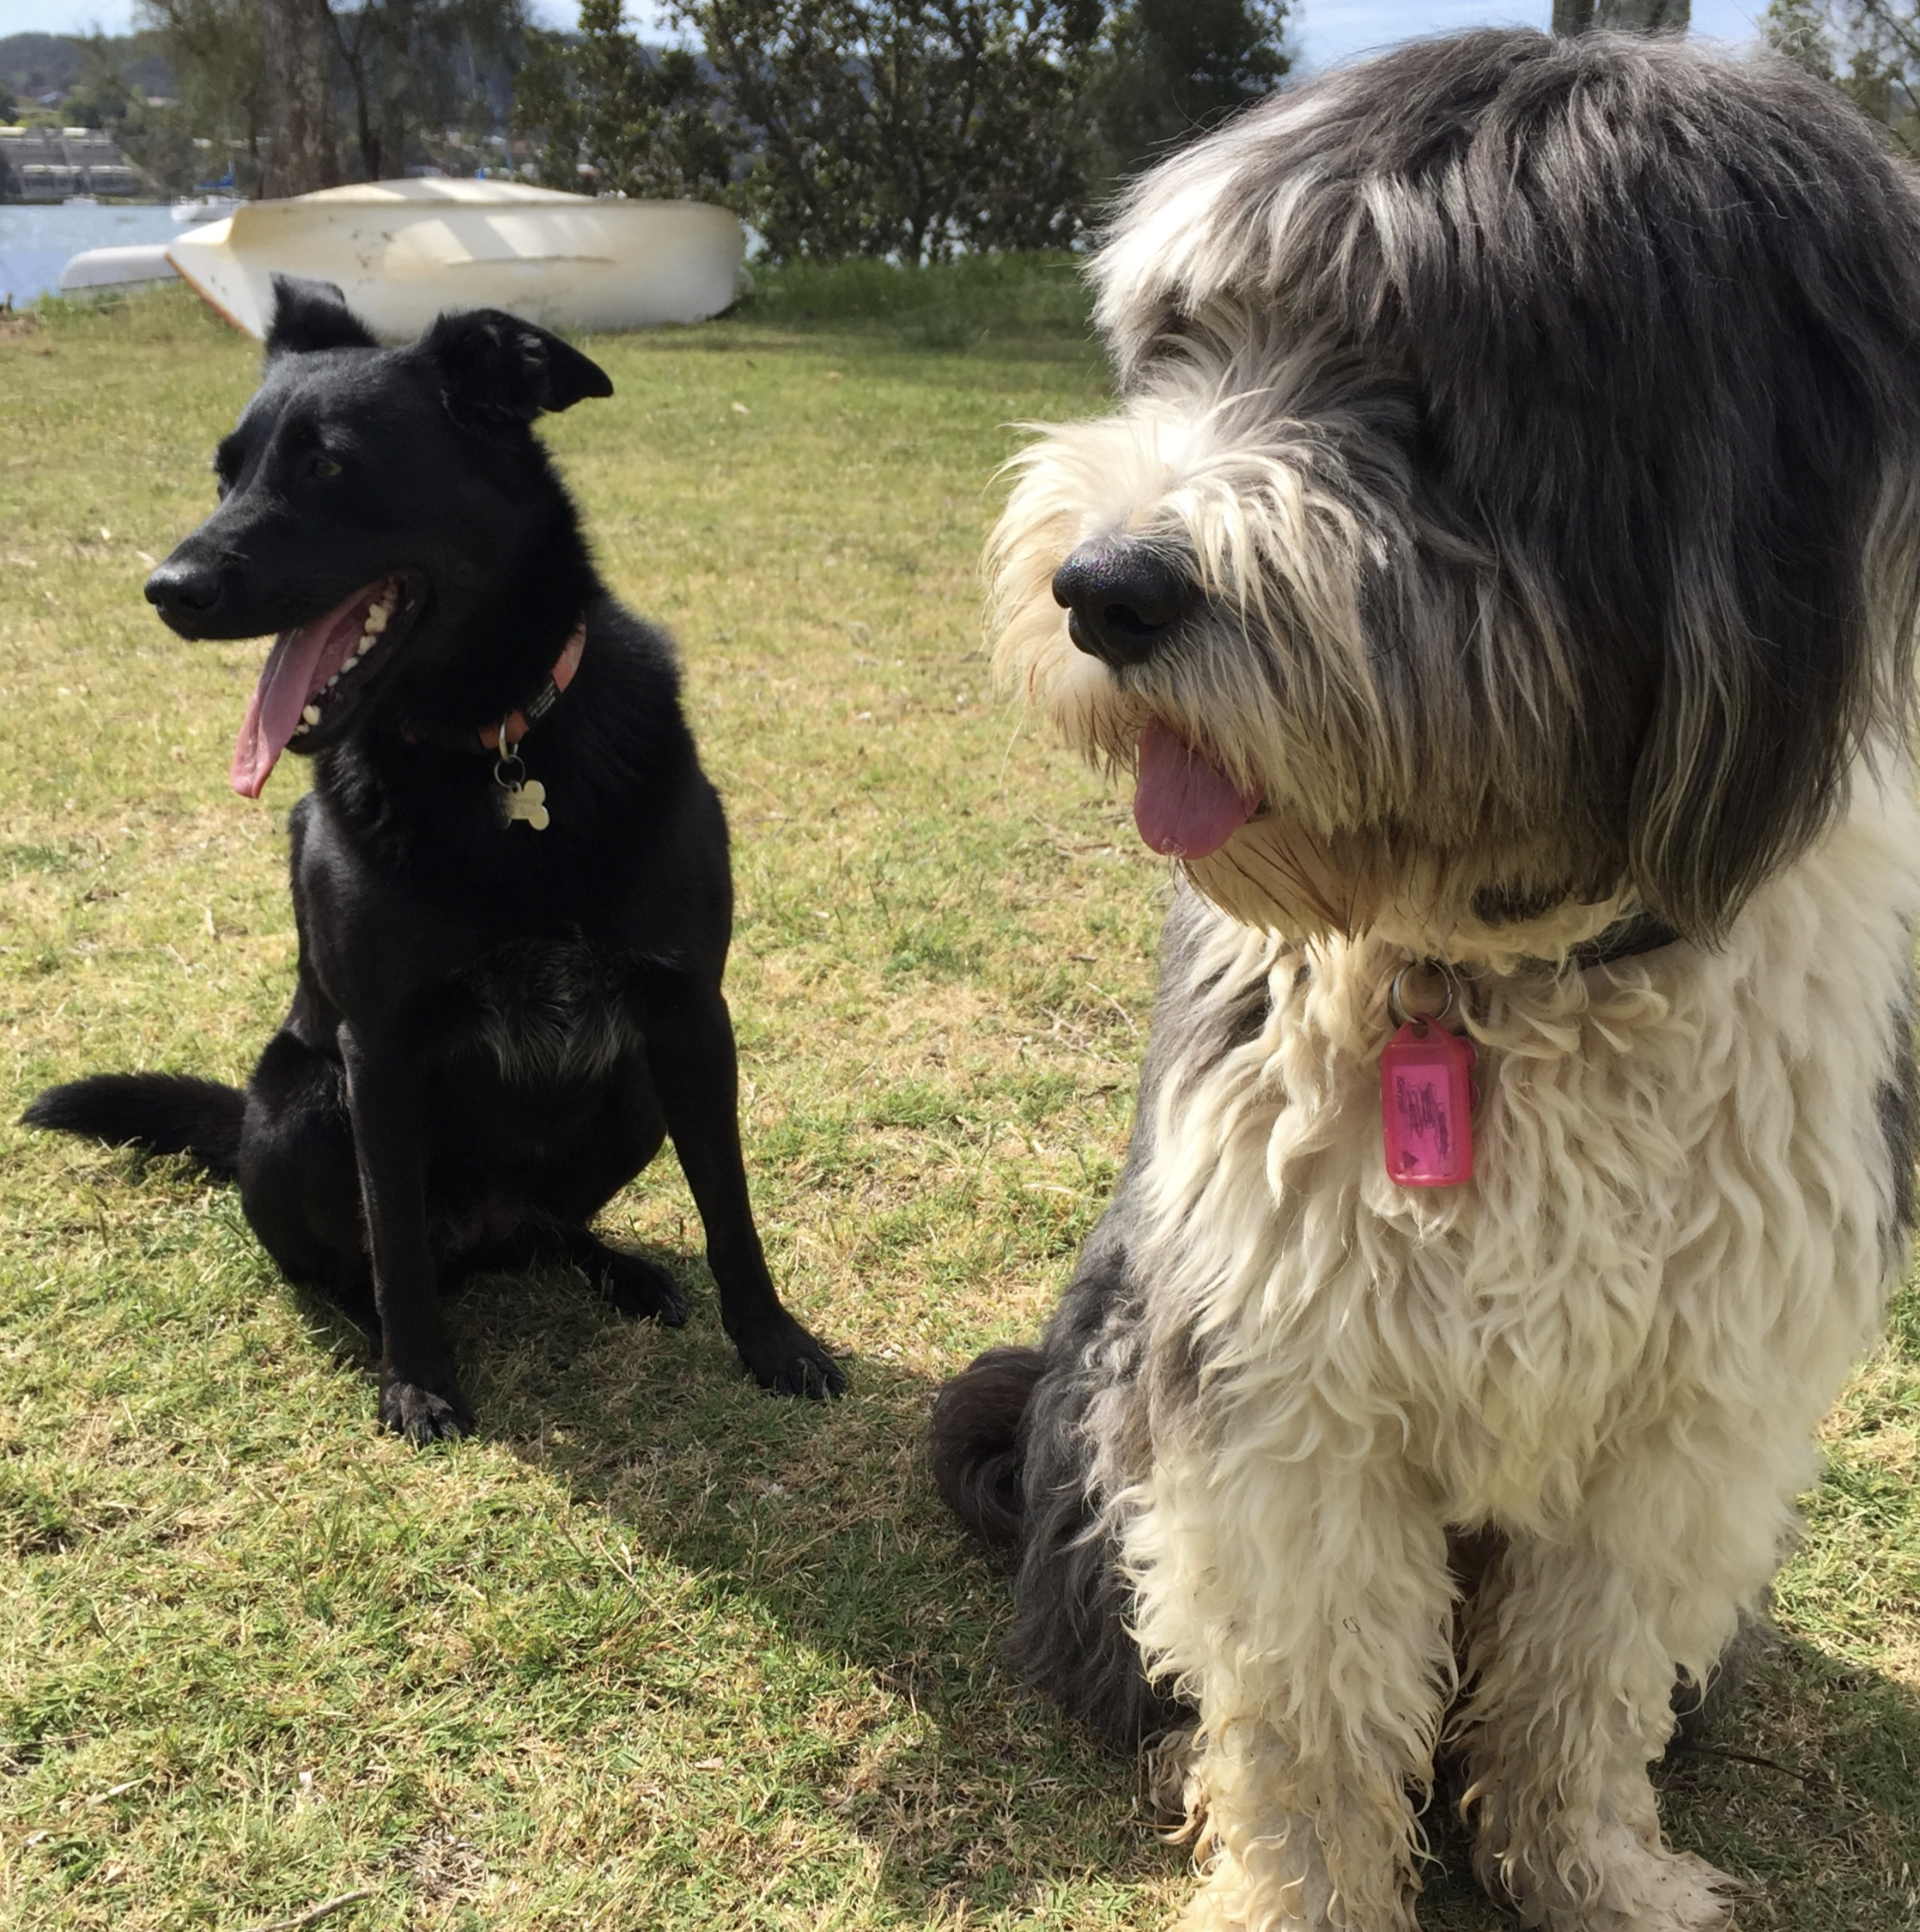 Kelpie & Old English Sheep Dog Lexi & Baxter - inseparable soul mates